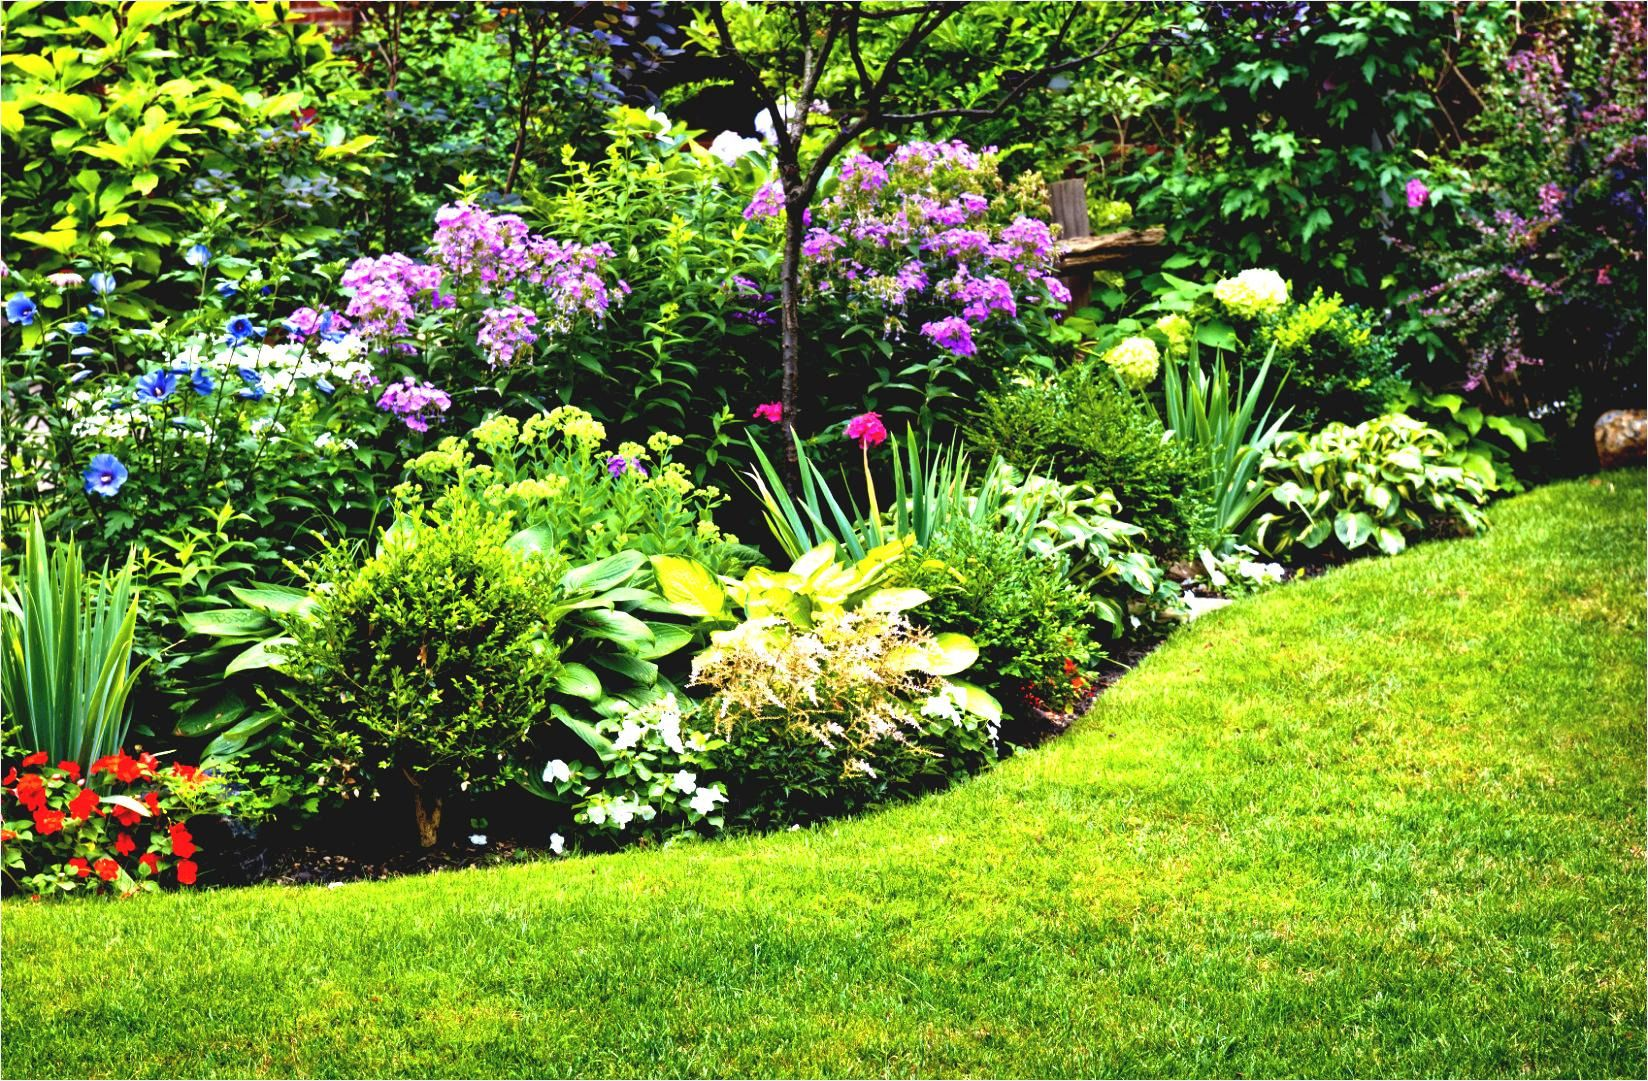 Simple Flower Garden Ideas Full Sun for Your Back Yard ...